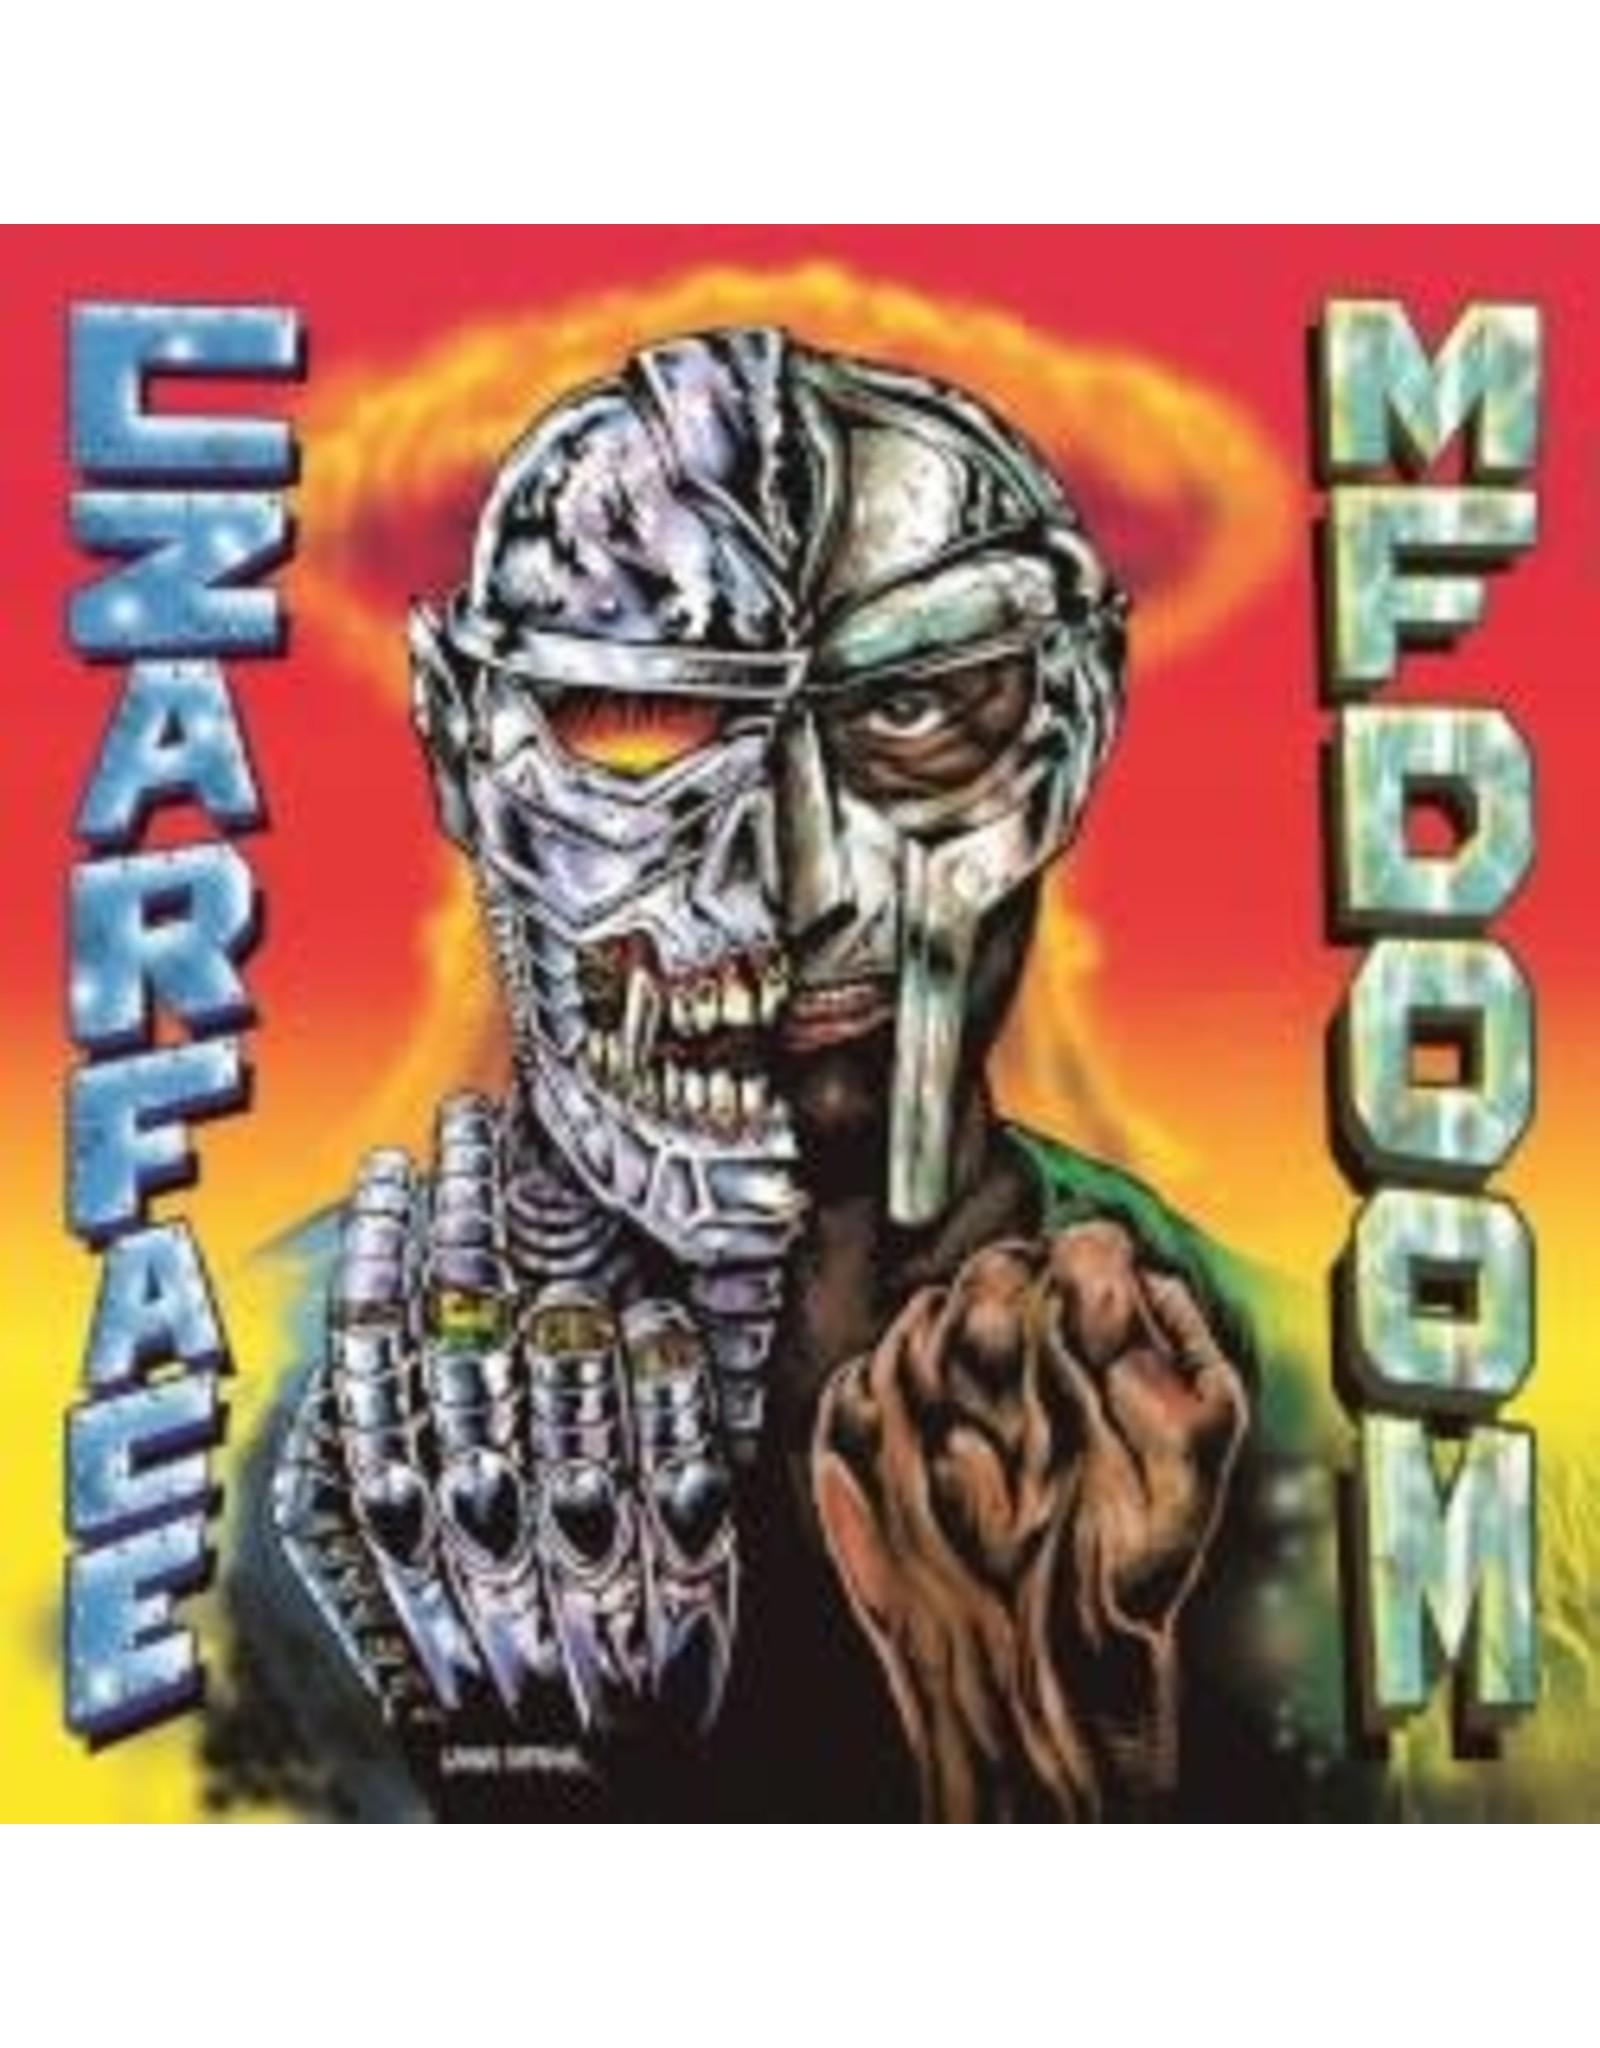 Czarface / MF Doom - Czarface Meets Metalface LP